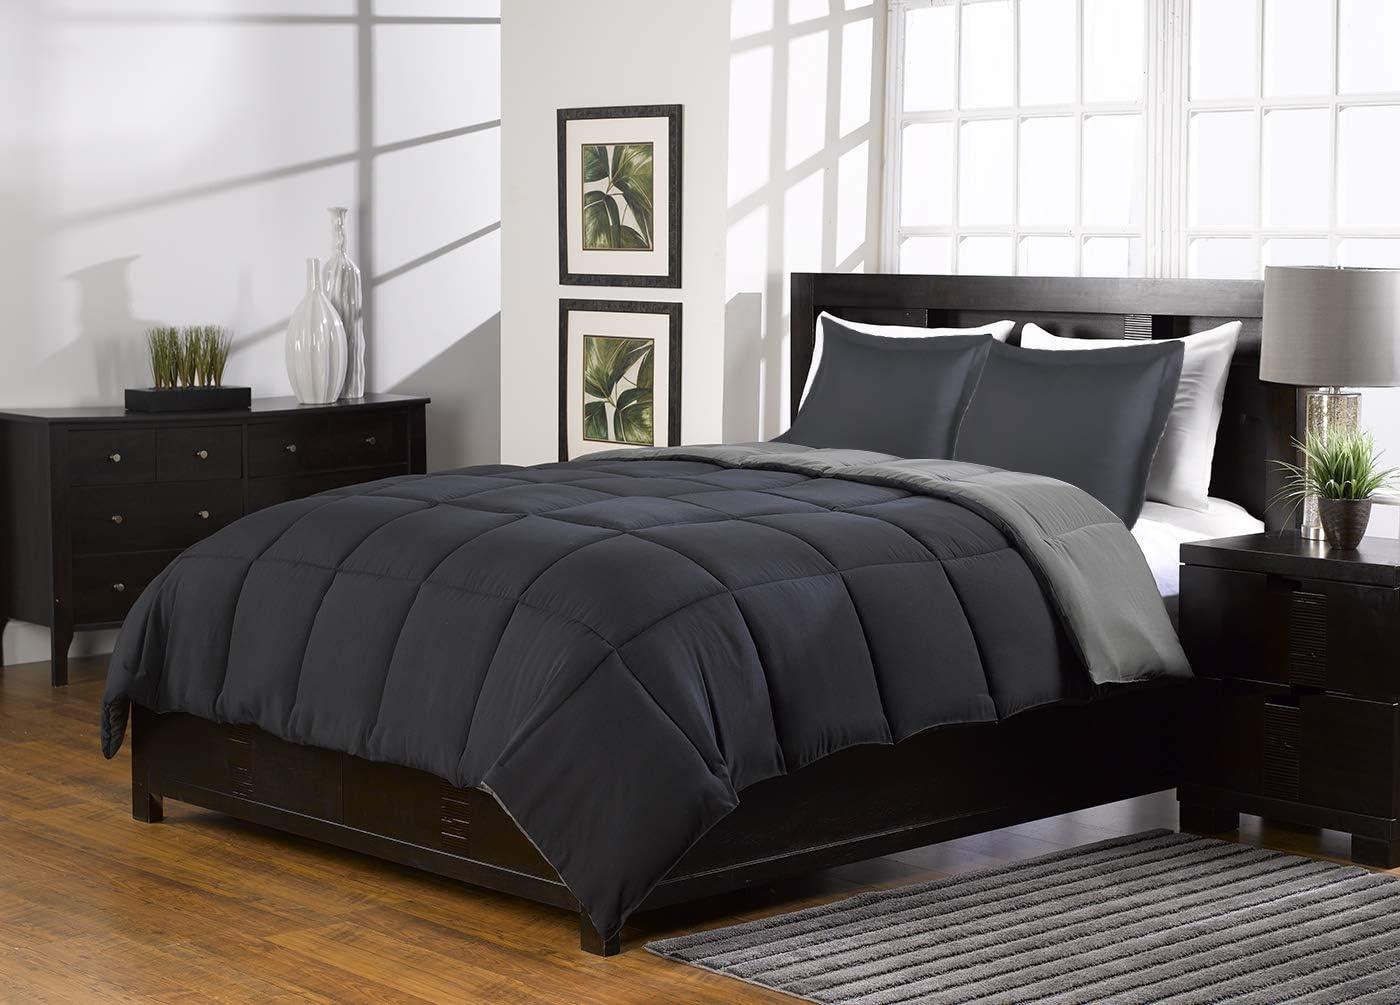 2 Piece Super Soft Reversible Black Gray Alternative Down Comforter Set Twin Size Bedding Set With 2 Reversible Shams Home Kitchen